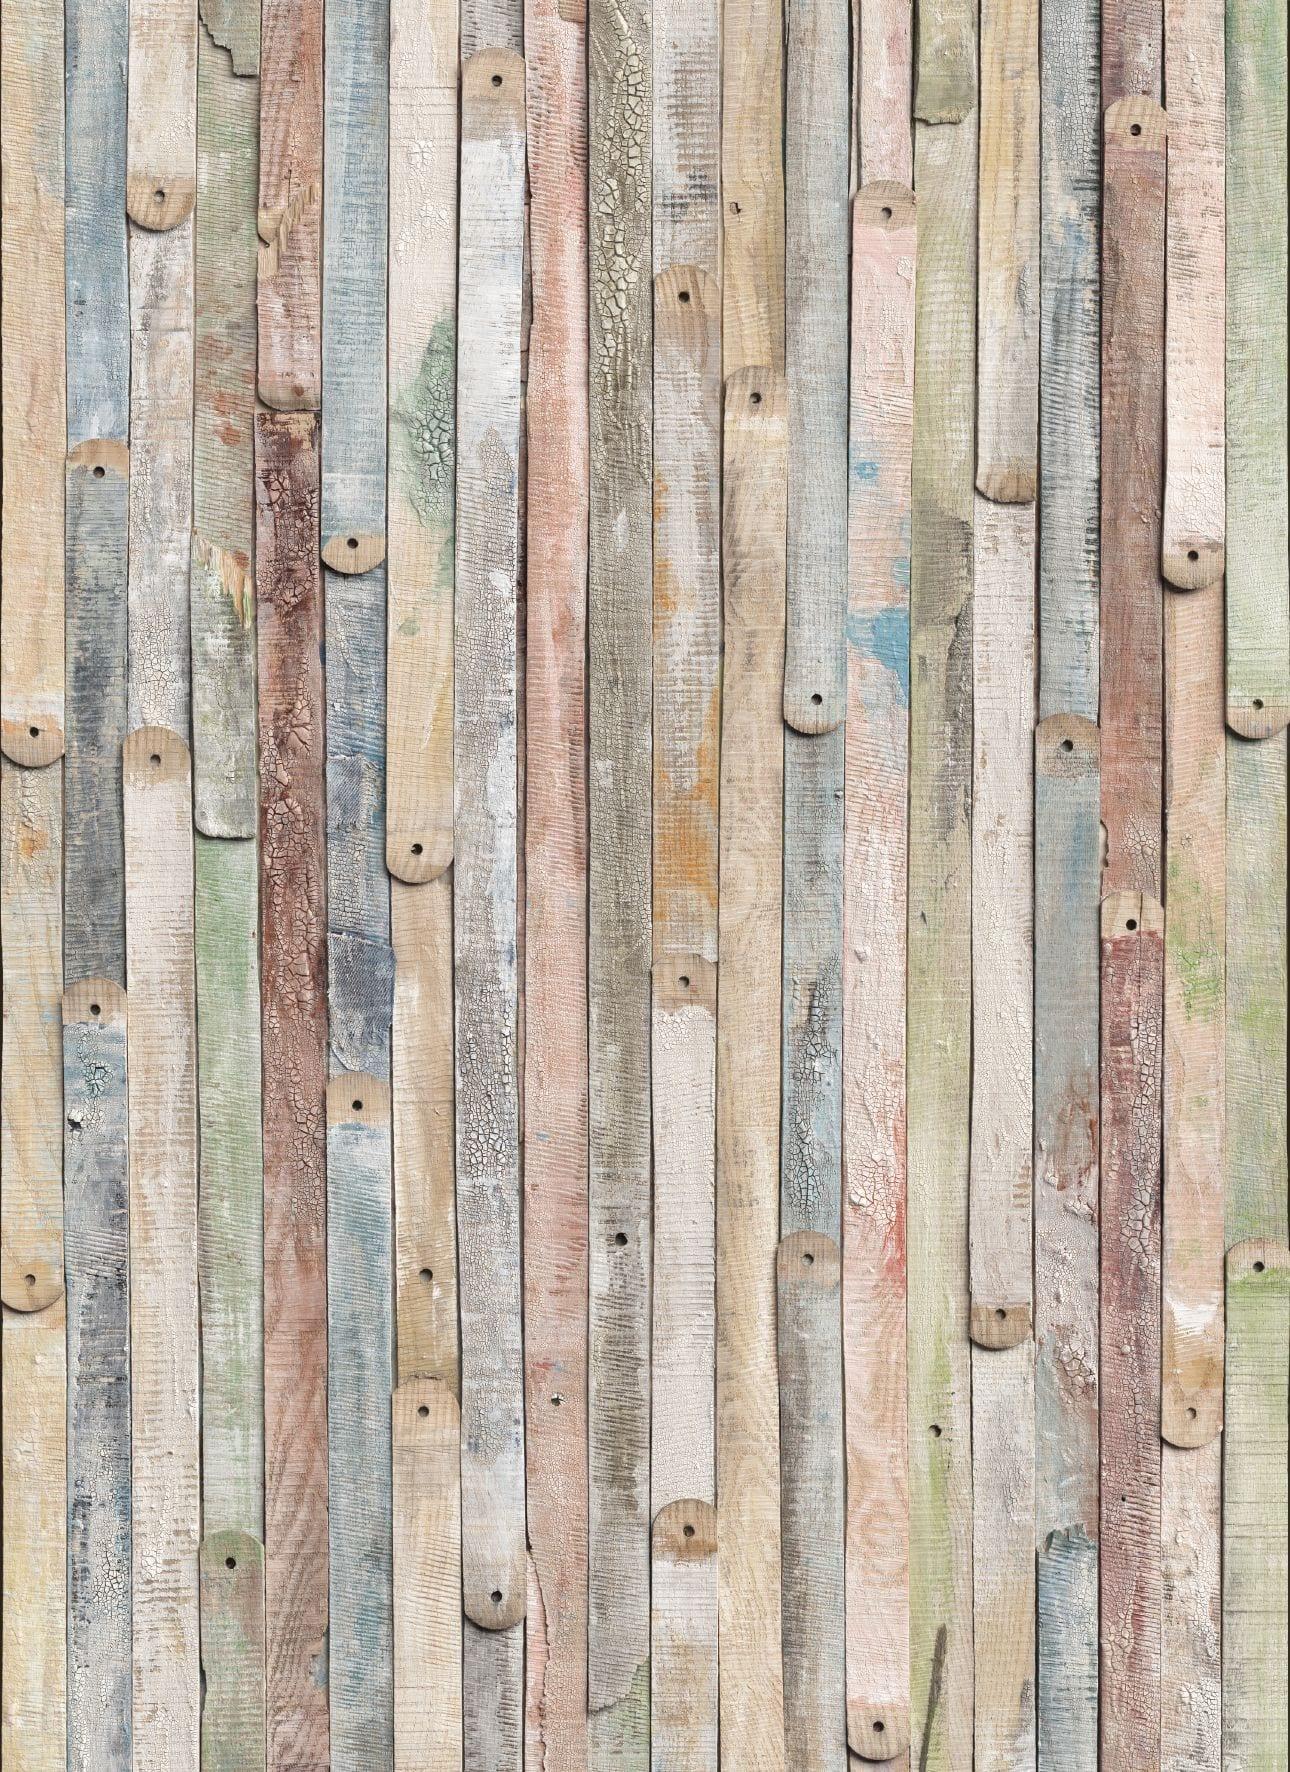 Fotomural Madera Vintage wood 4910 komar